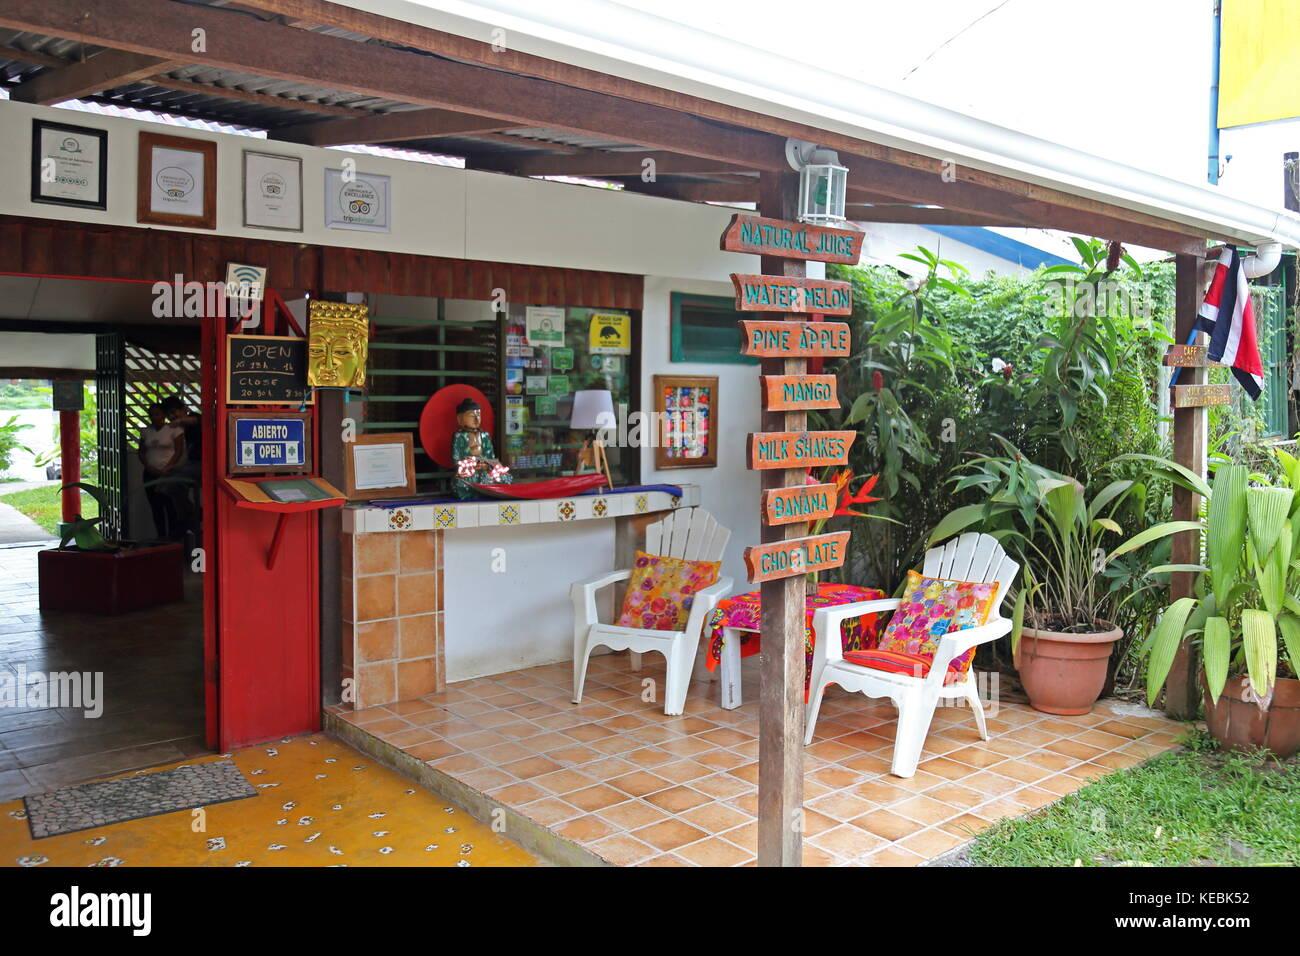 Budda Café, Tortuguero village centre, Limón province, Caribbean Sea, Costa Rica, Central America - Stock Image